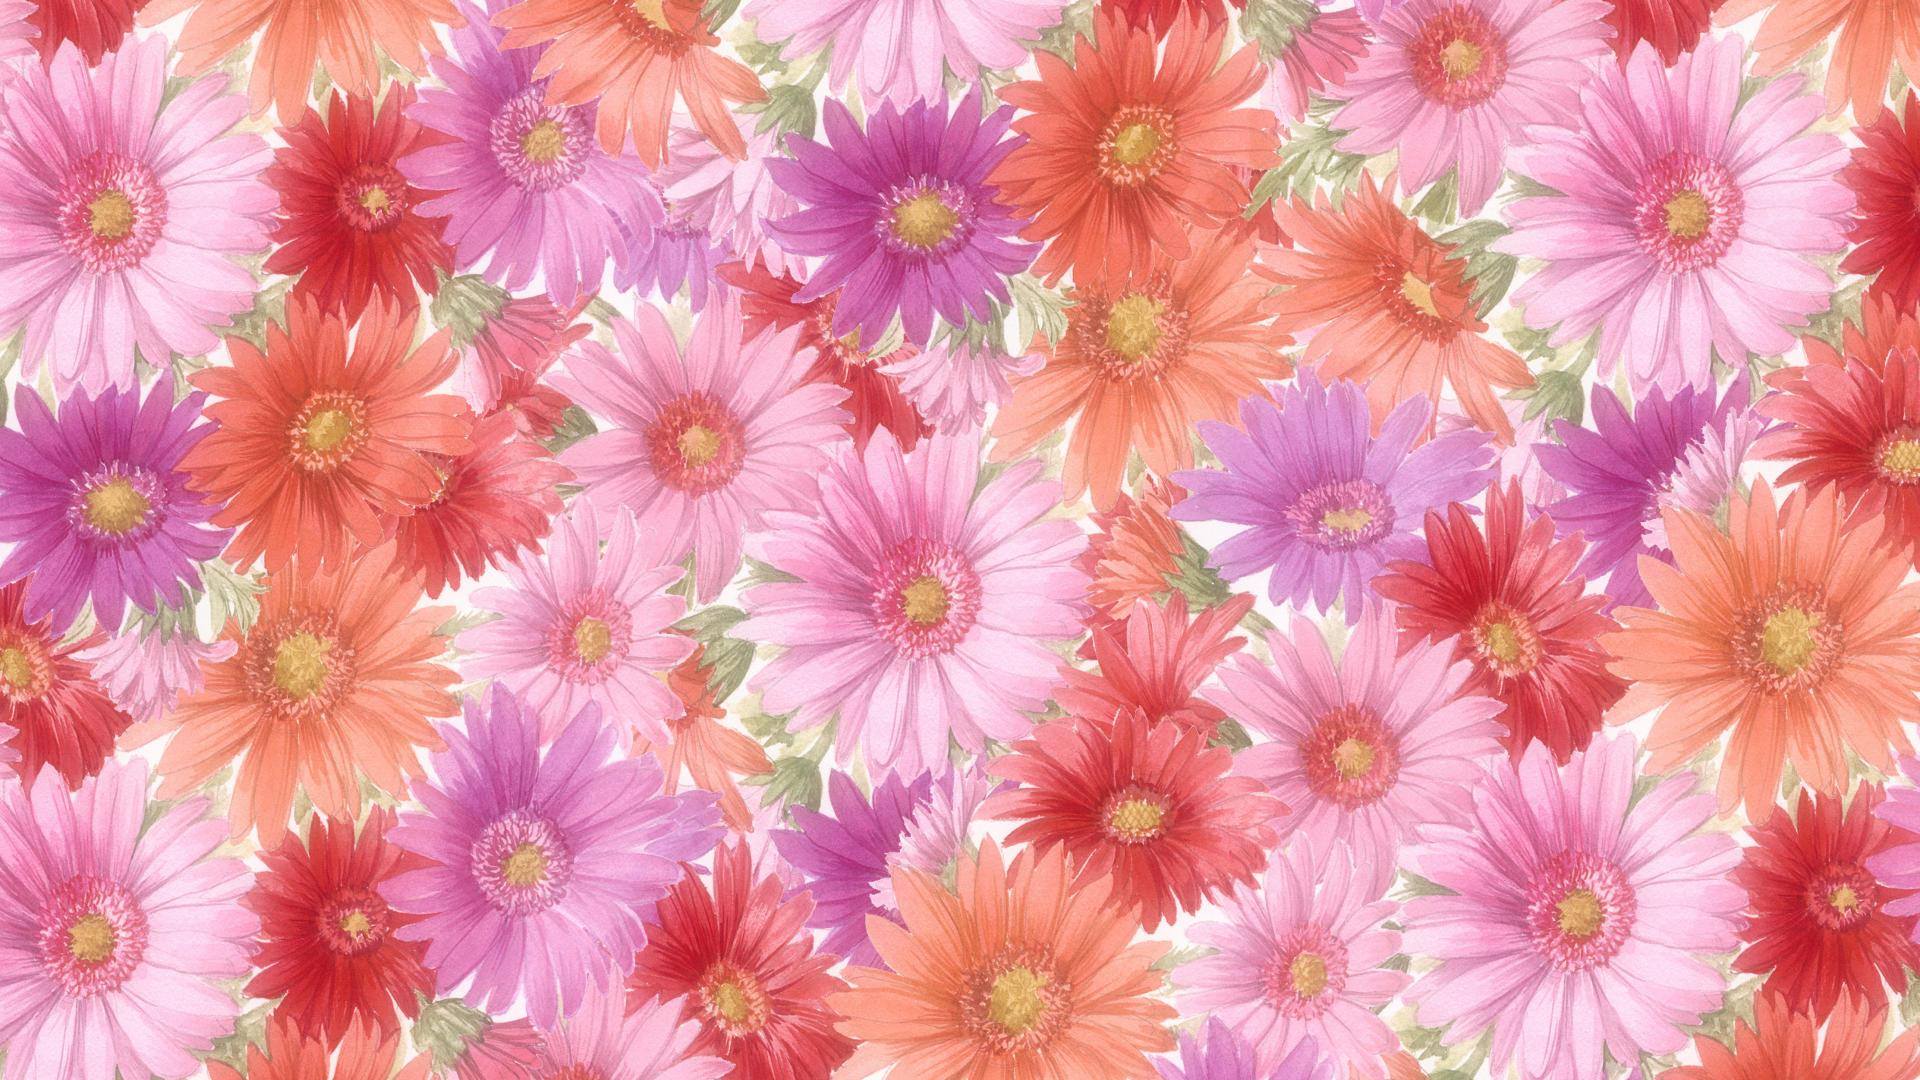 Flowers wallpapers high definition wallpapers high definition - Flowers Wallpaper 155 Free Wallpapers Free Desktop Wallpapers Hd